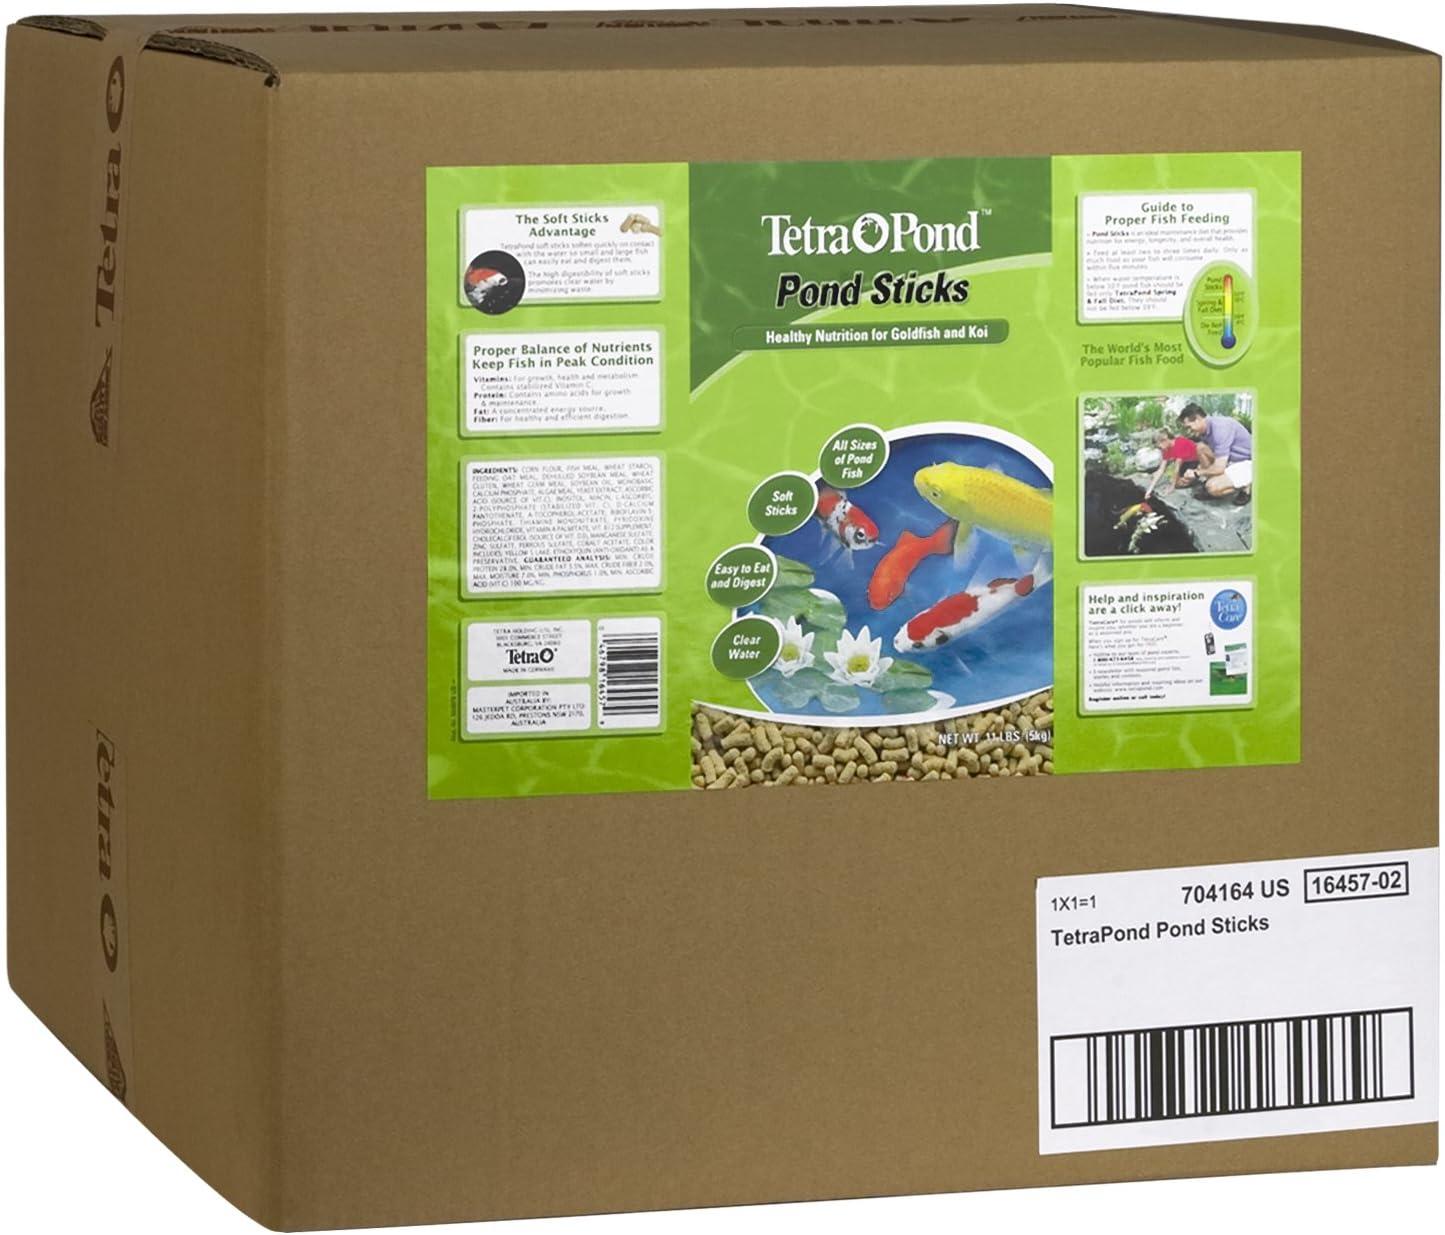 TetraPond Pond Sticks 11 Pounds, Pond Fish Food, For Goldfish And Koi, 11.00 lb, 40 L (16457)